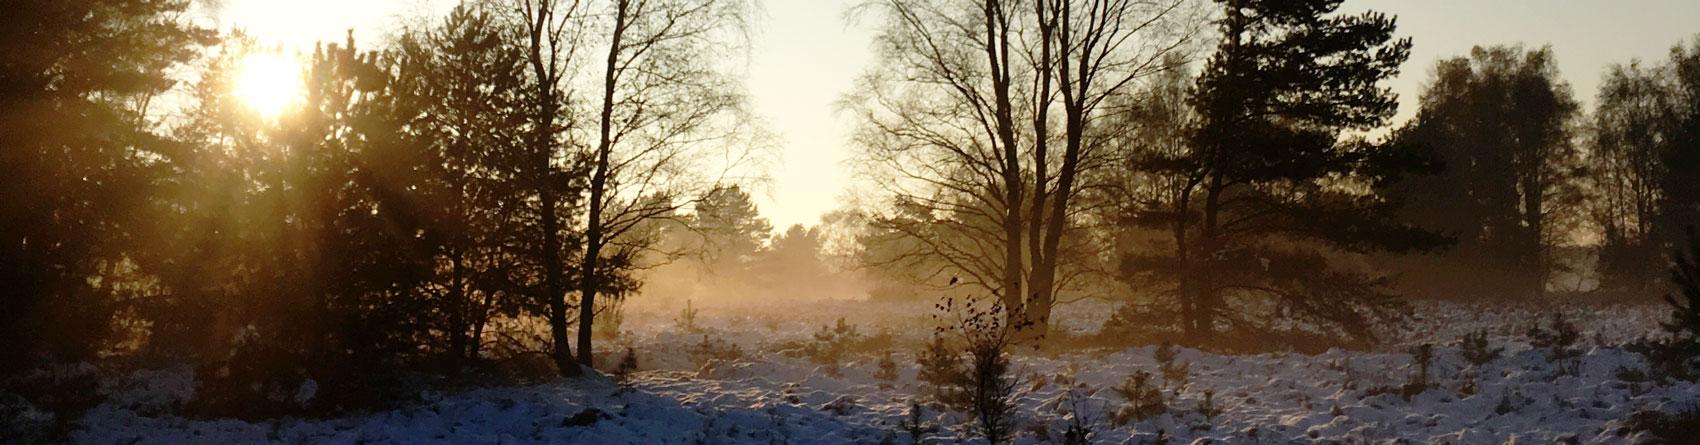 handeloh-titelbild-winter